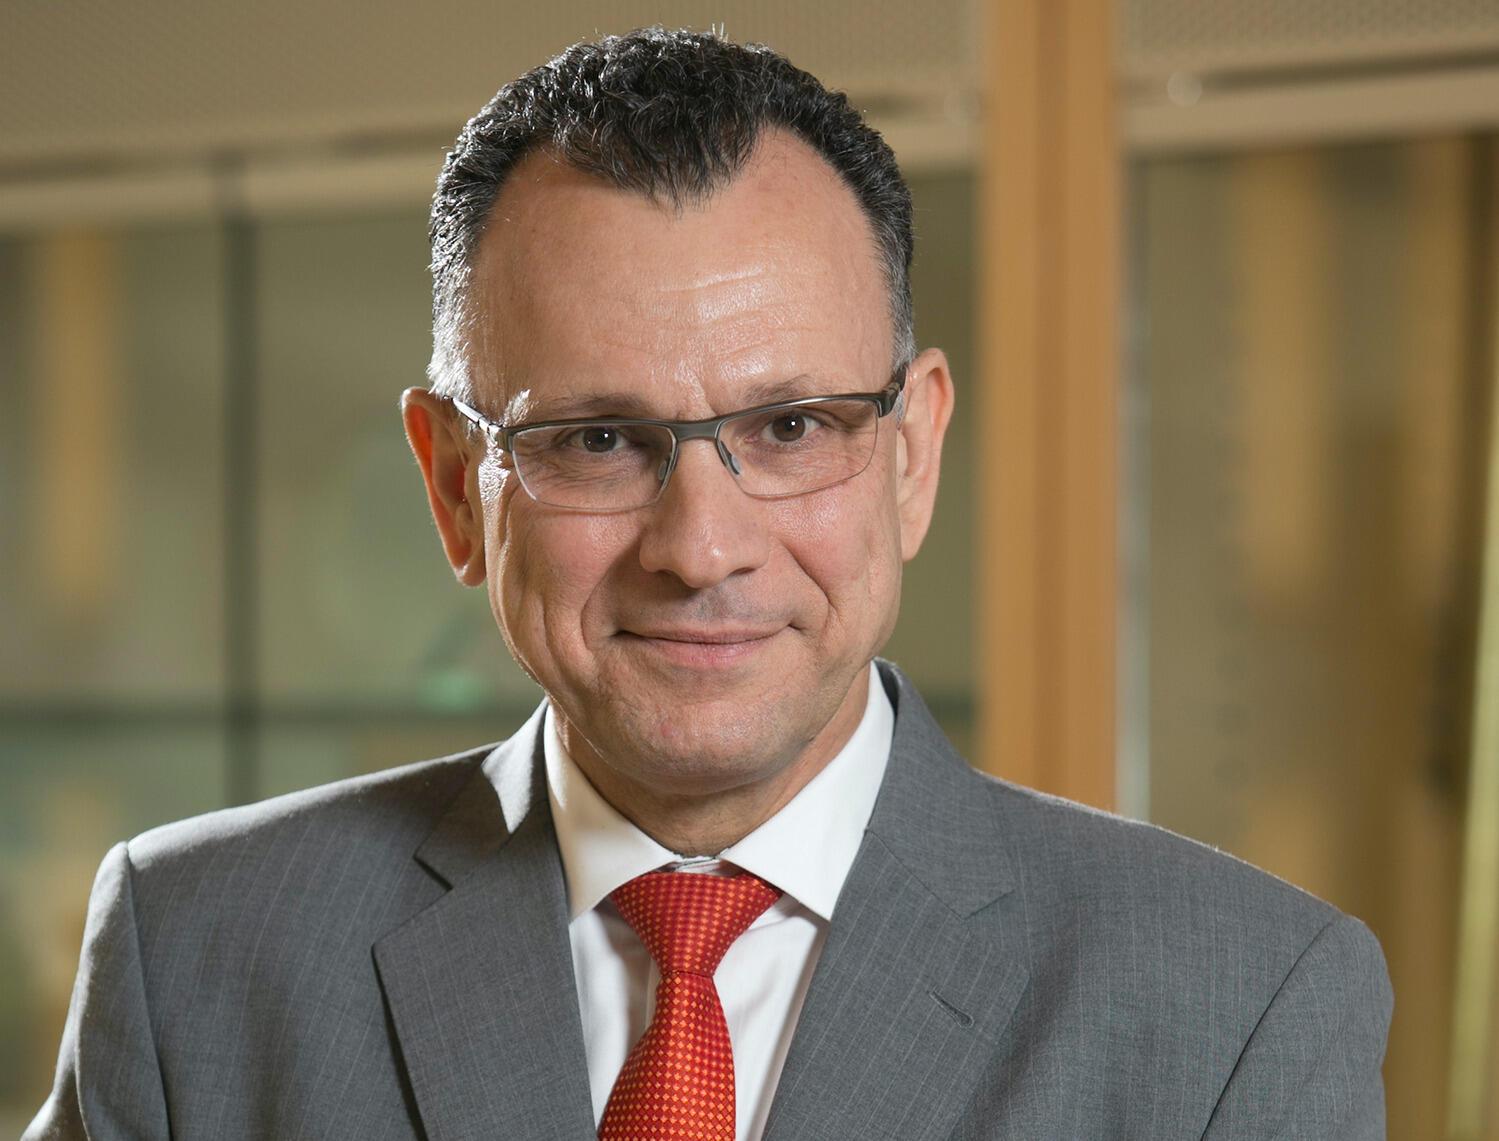 Fotis Sotiropoulos, Ph.D.